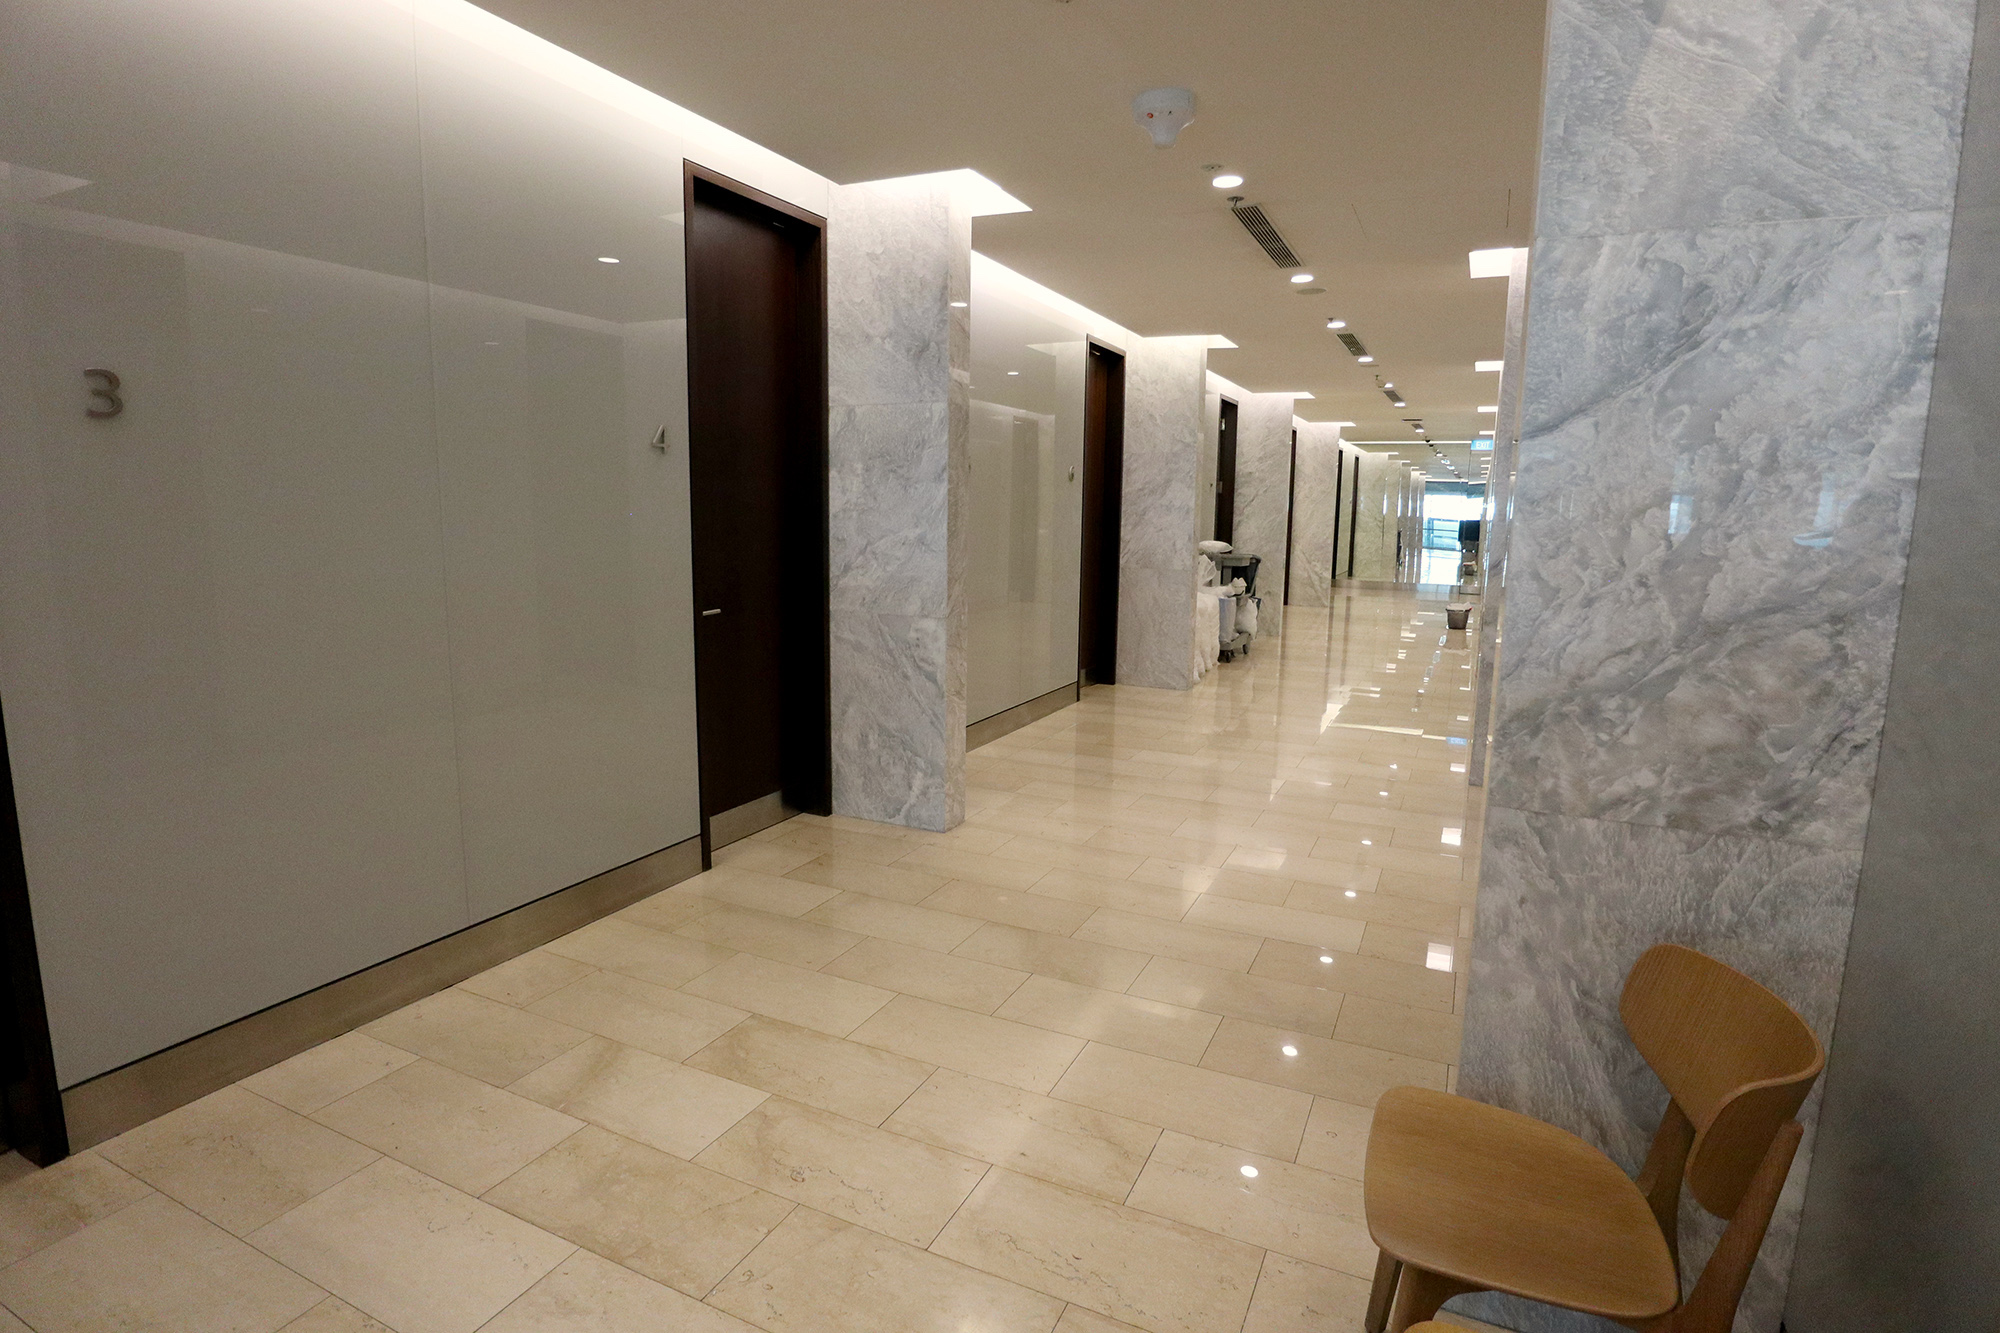 Showers Corridor